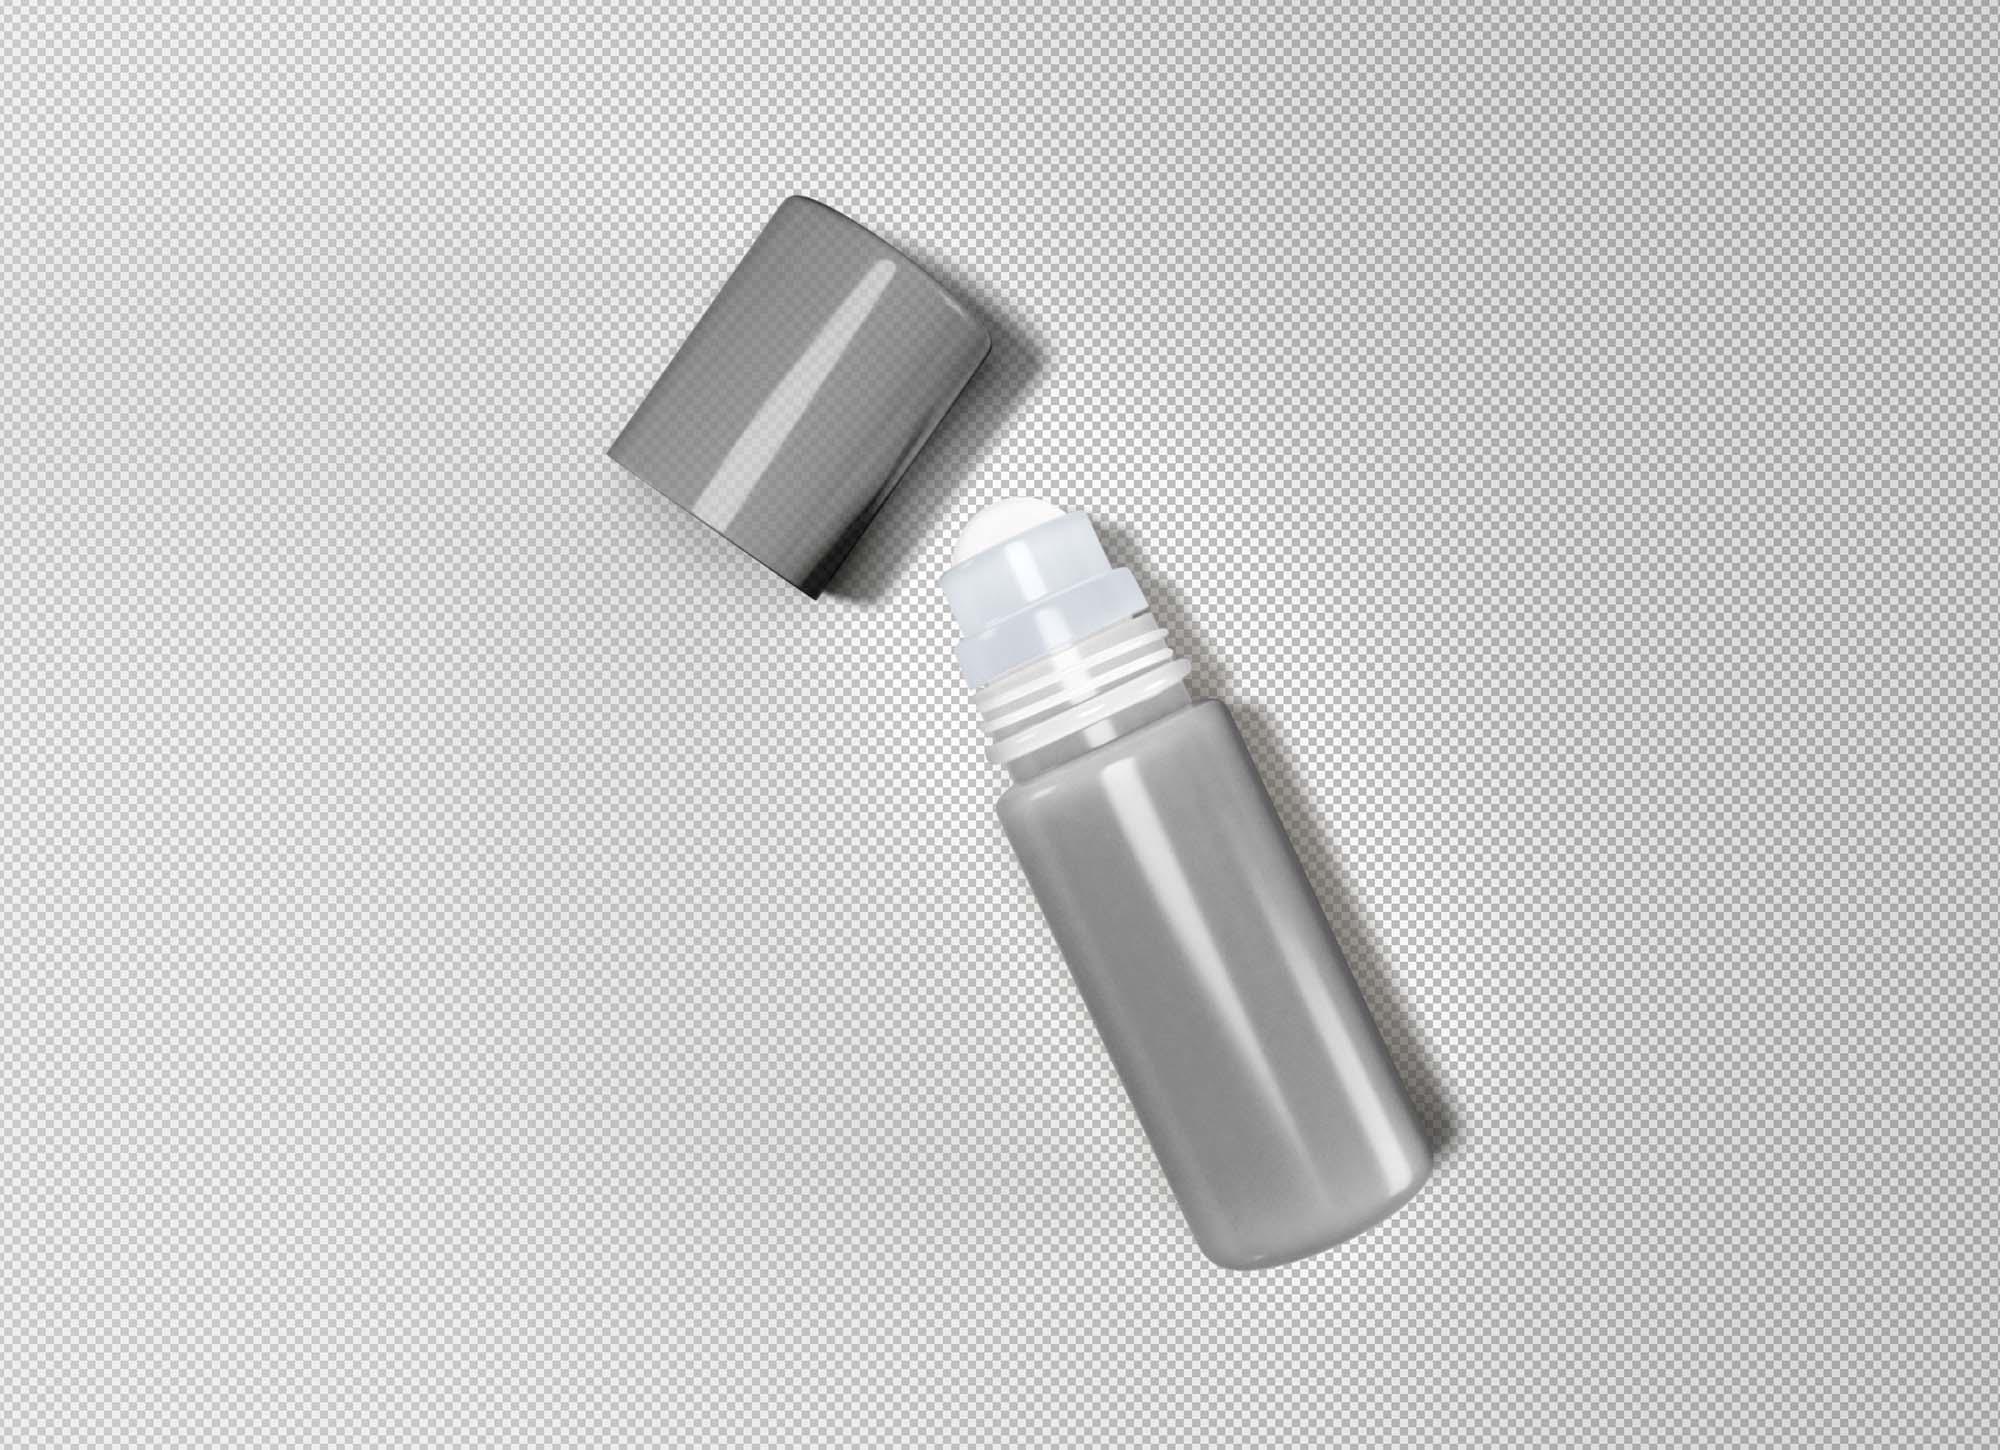 Rollerball Perfume Mockup 2